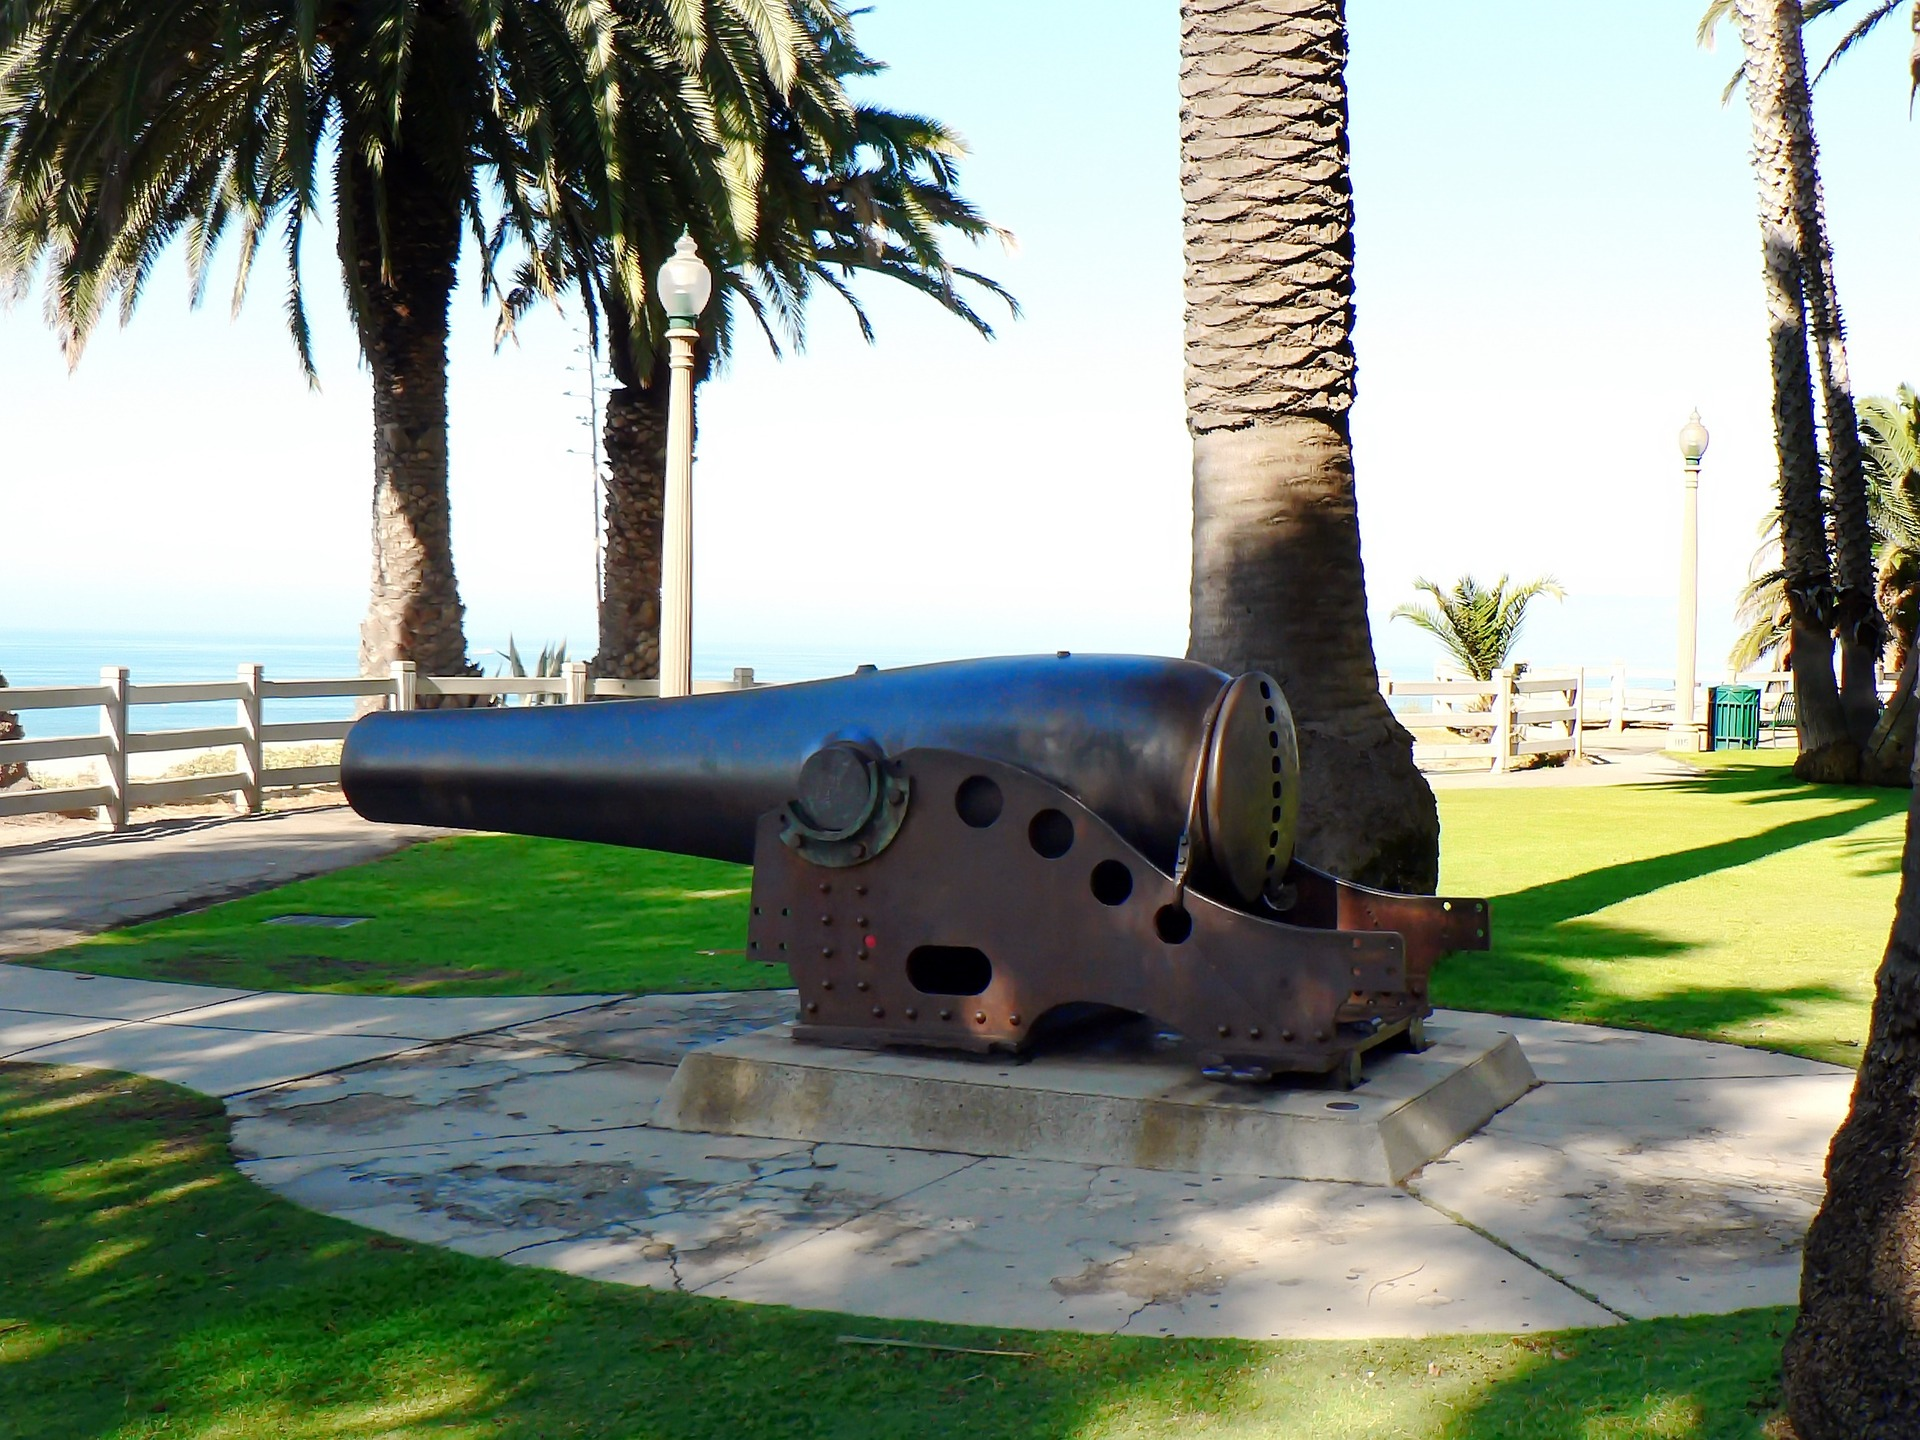 Cannon at Santa Monica Beach, Los Angeles